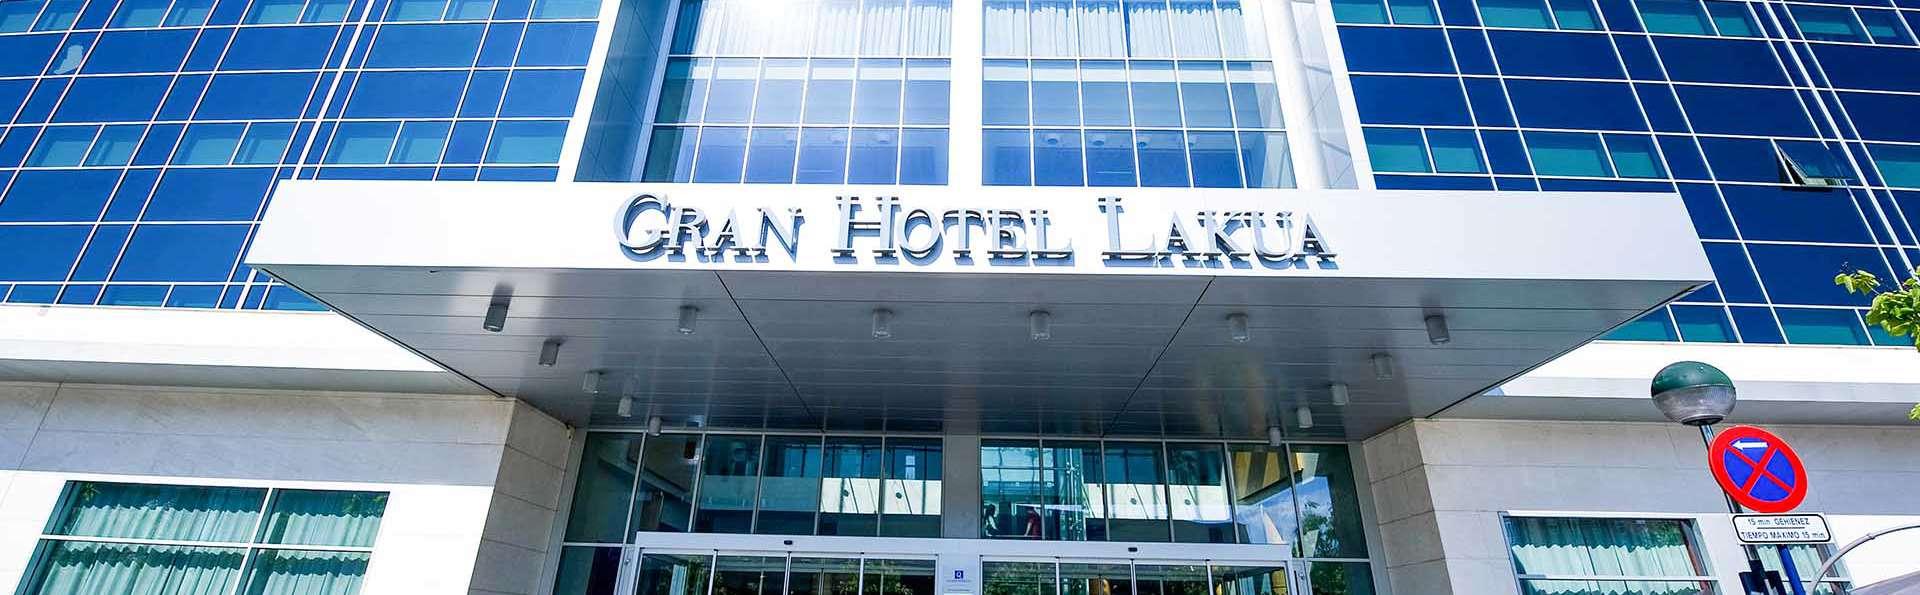 Gran Hotel Lakua - EDIT_FRONT_03.jpg